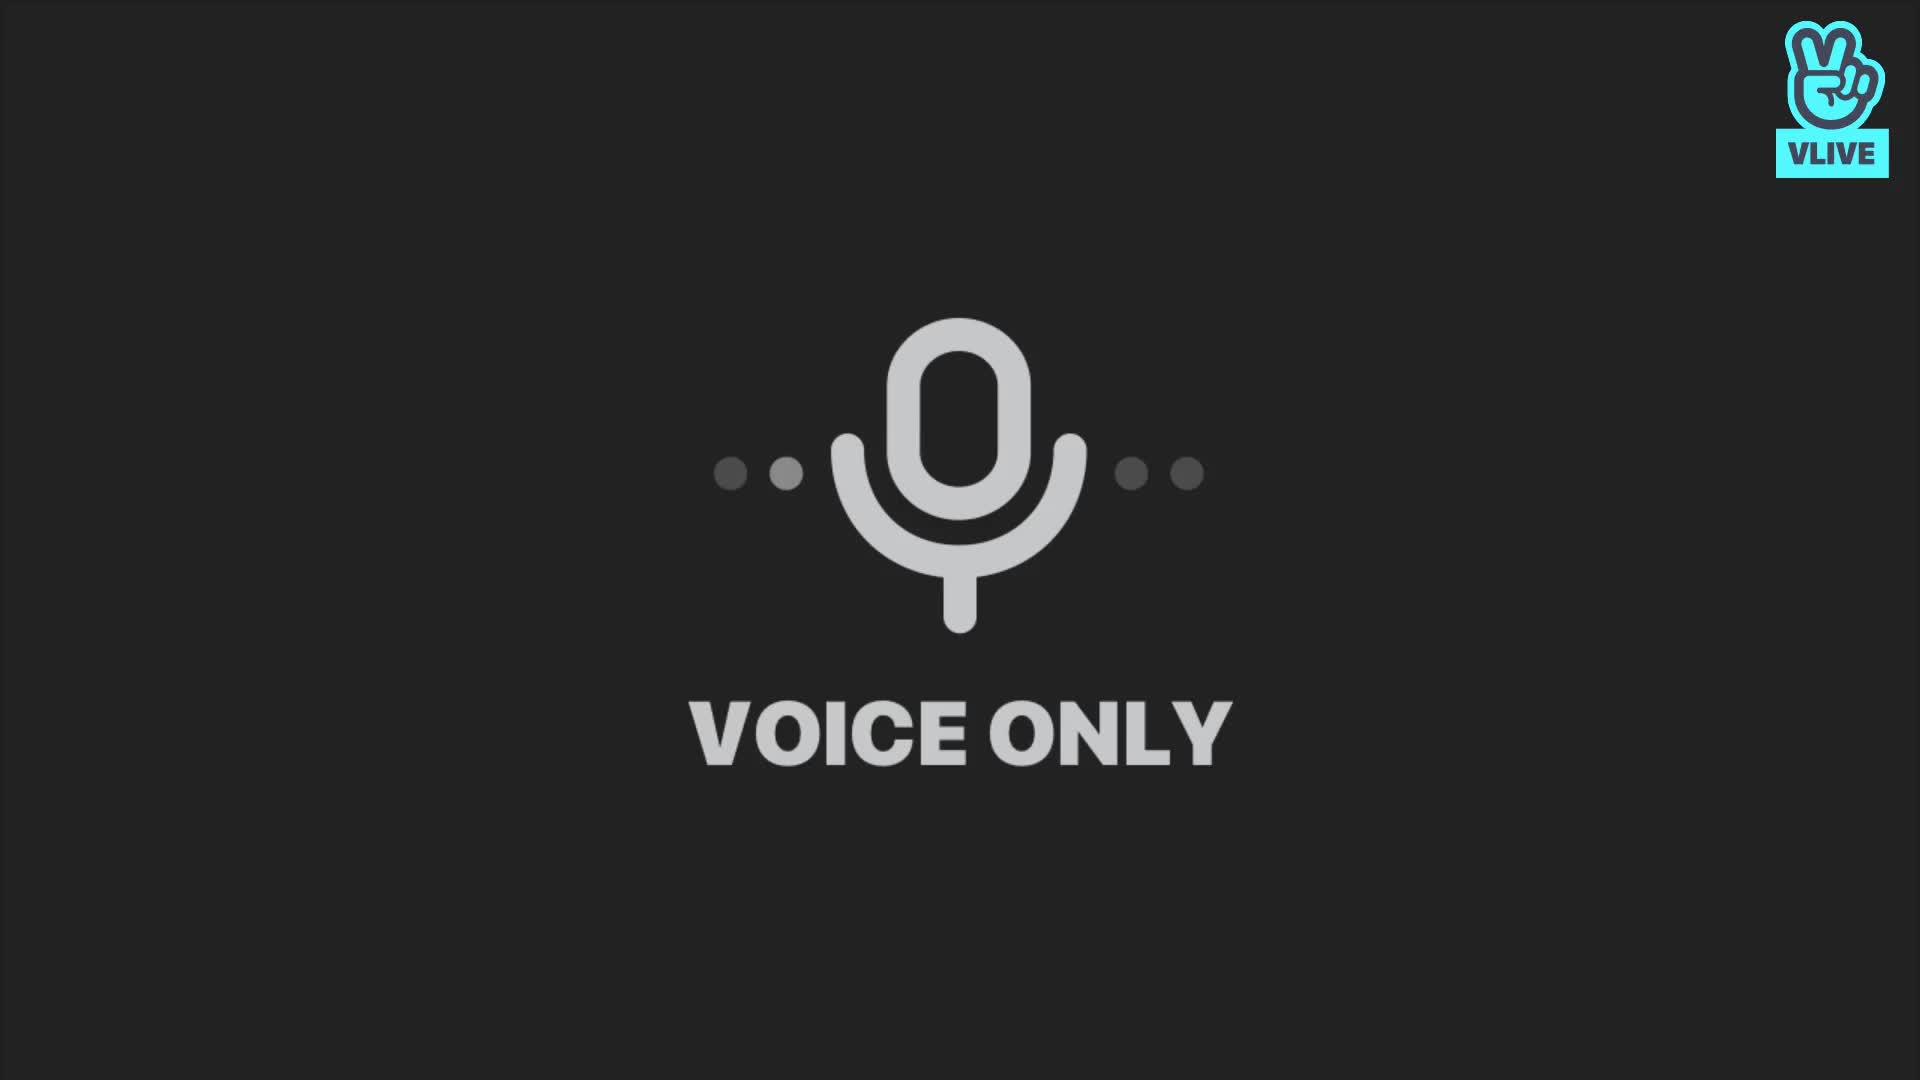 [RADIO] 캐럿들 귀대귀대 #67 정한이의 따뜻한 우유 한 잔